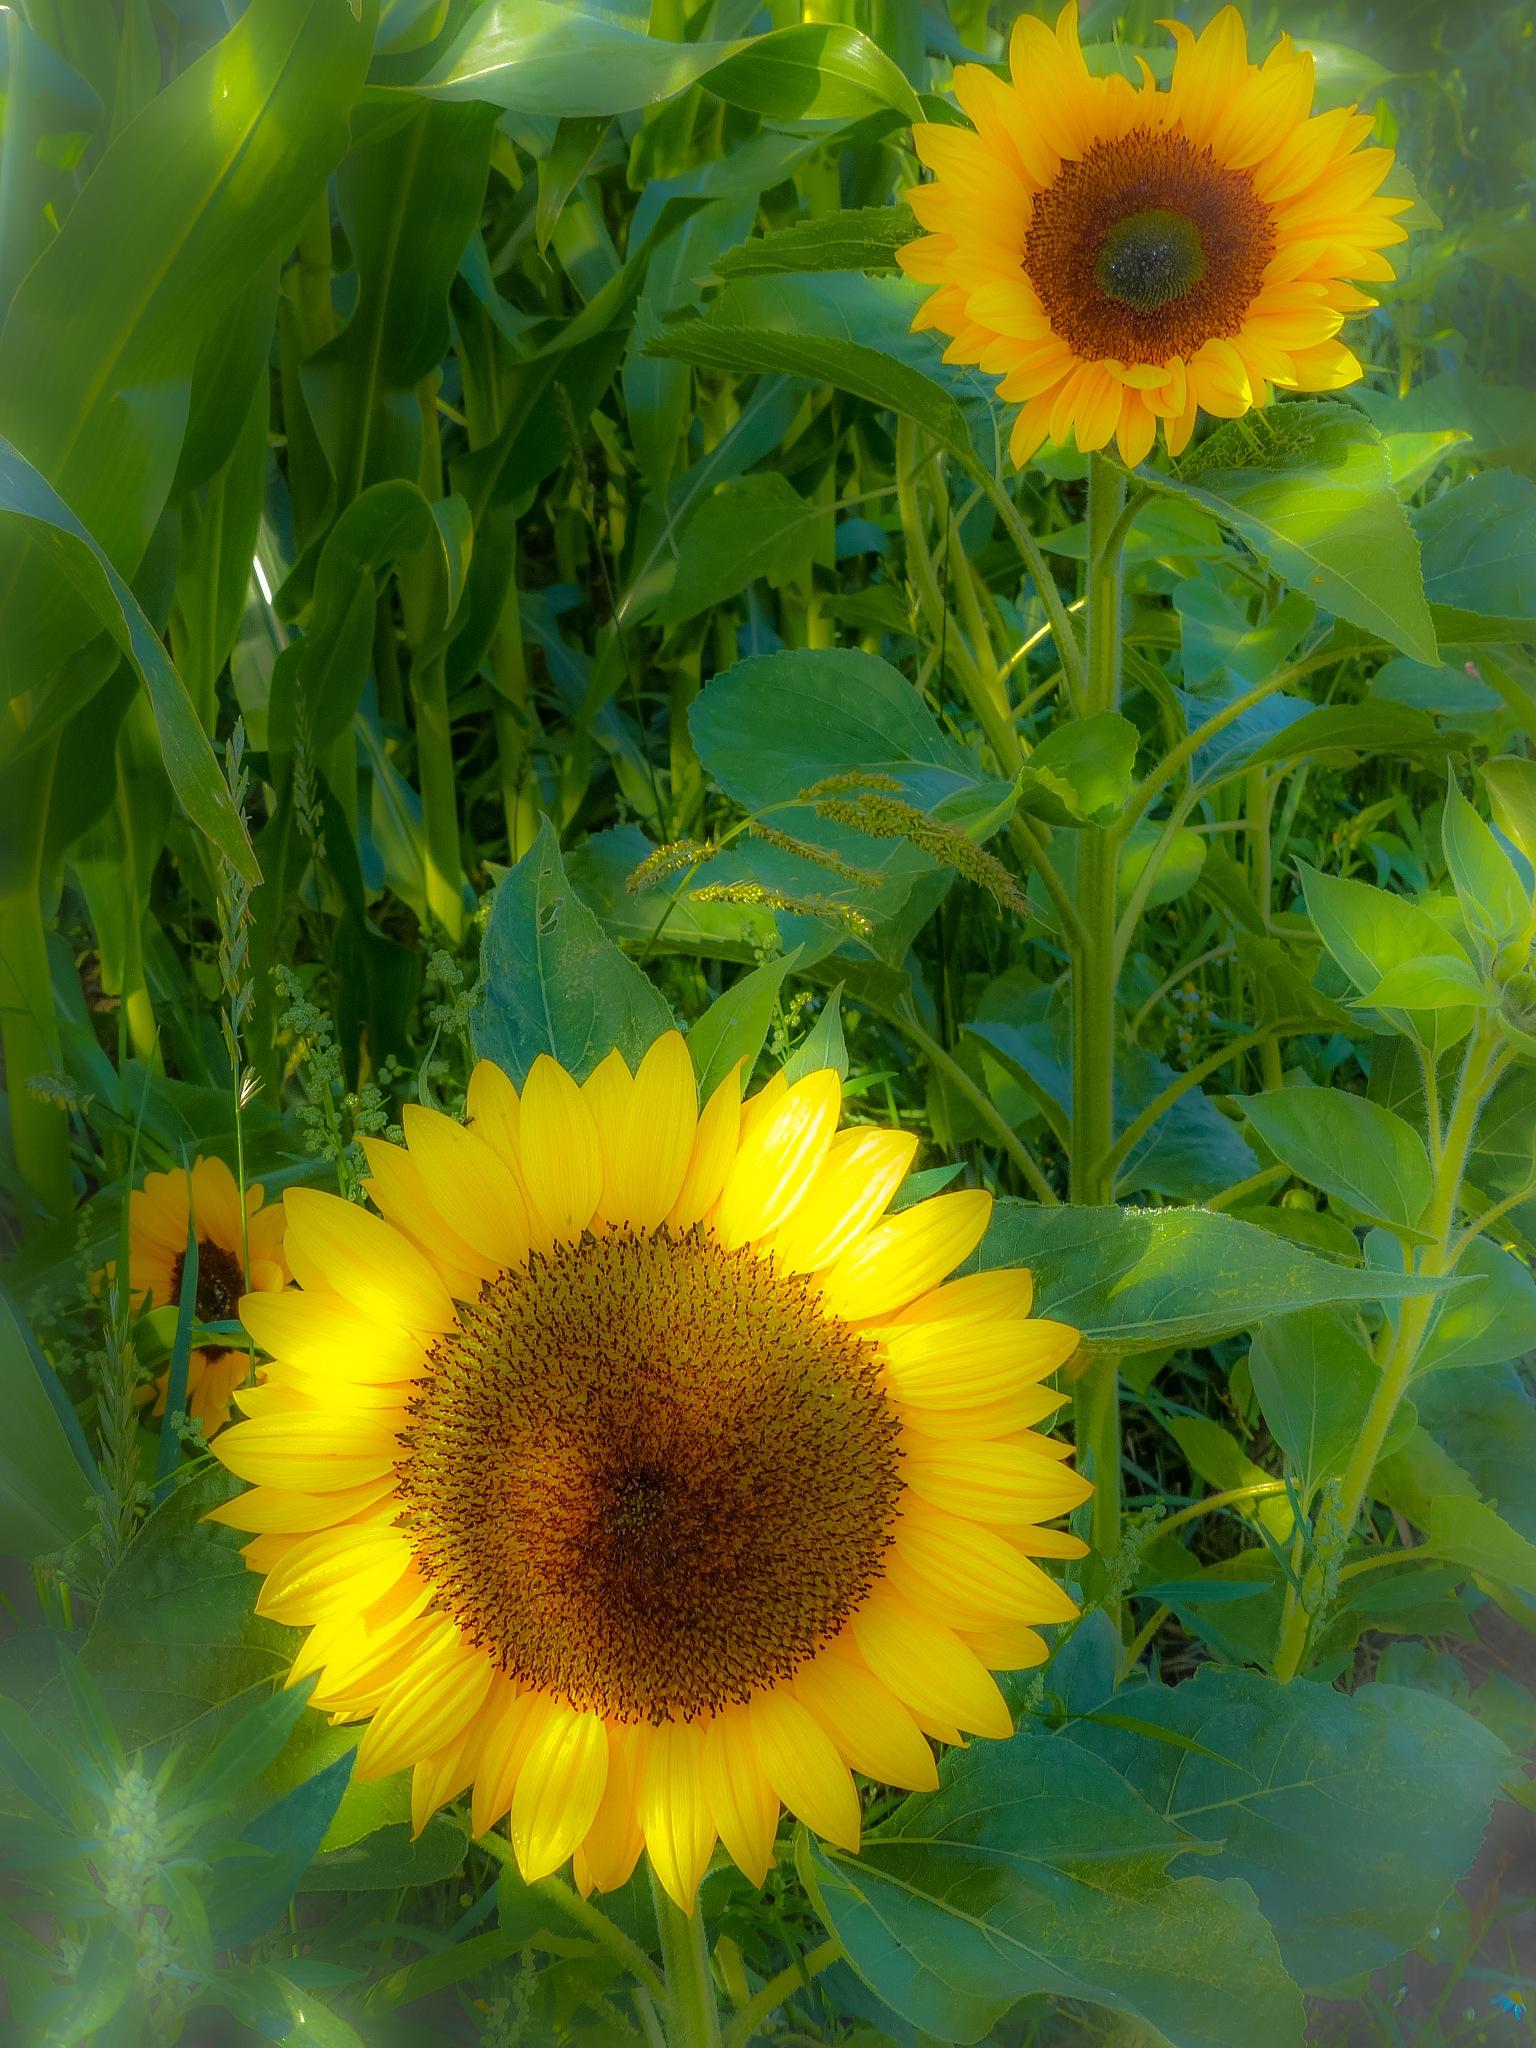 sunflowers by Paul Geutjes